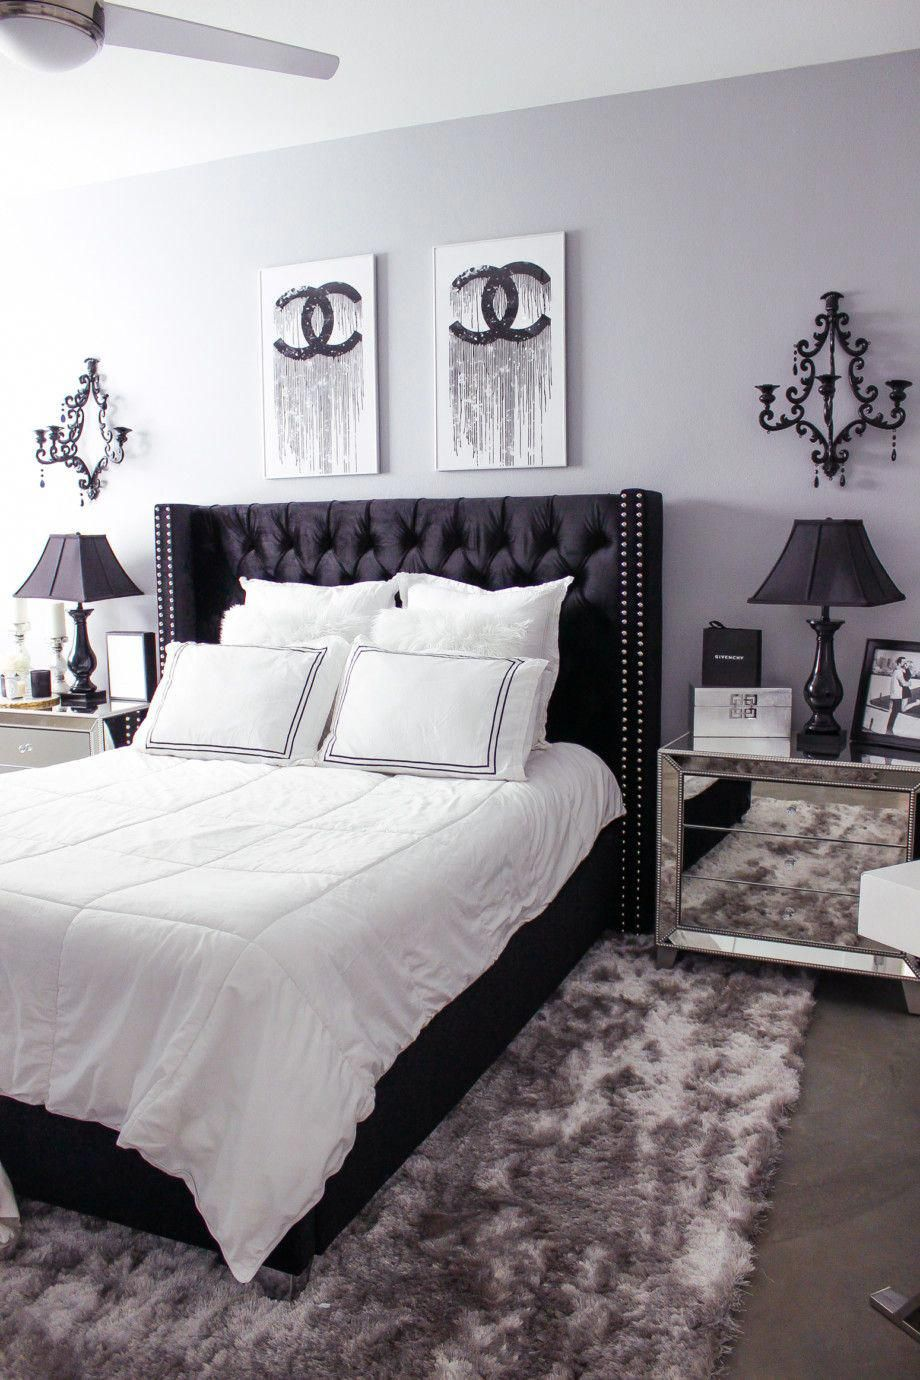 Black & White Bedroom Decor   Chic, Glam Bedroom Decor ...